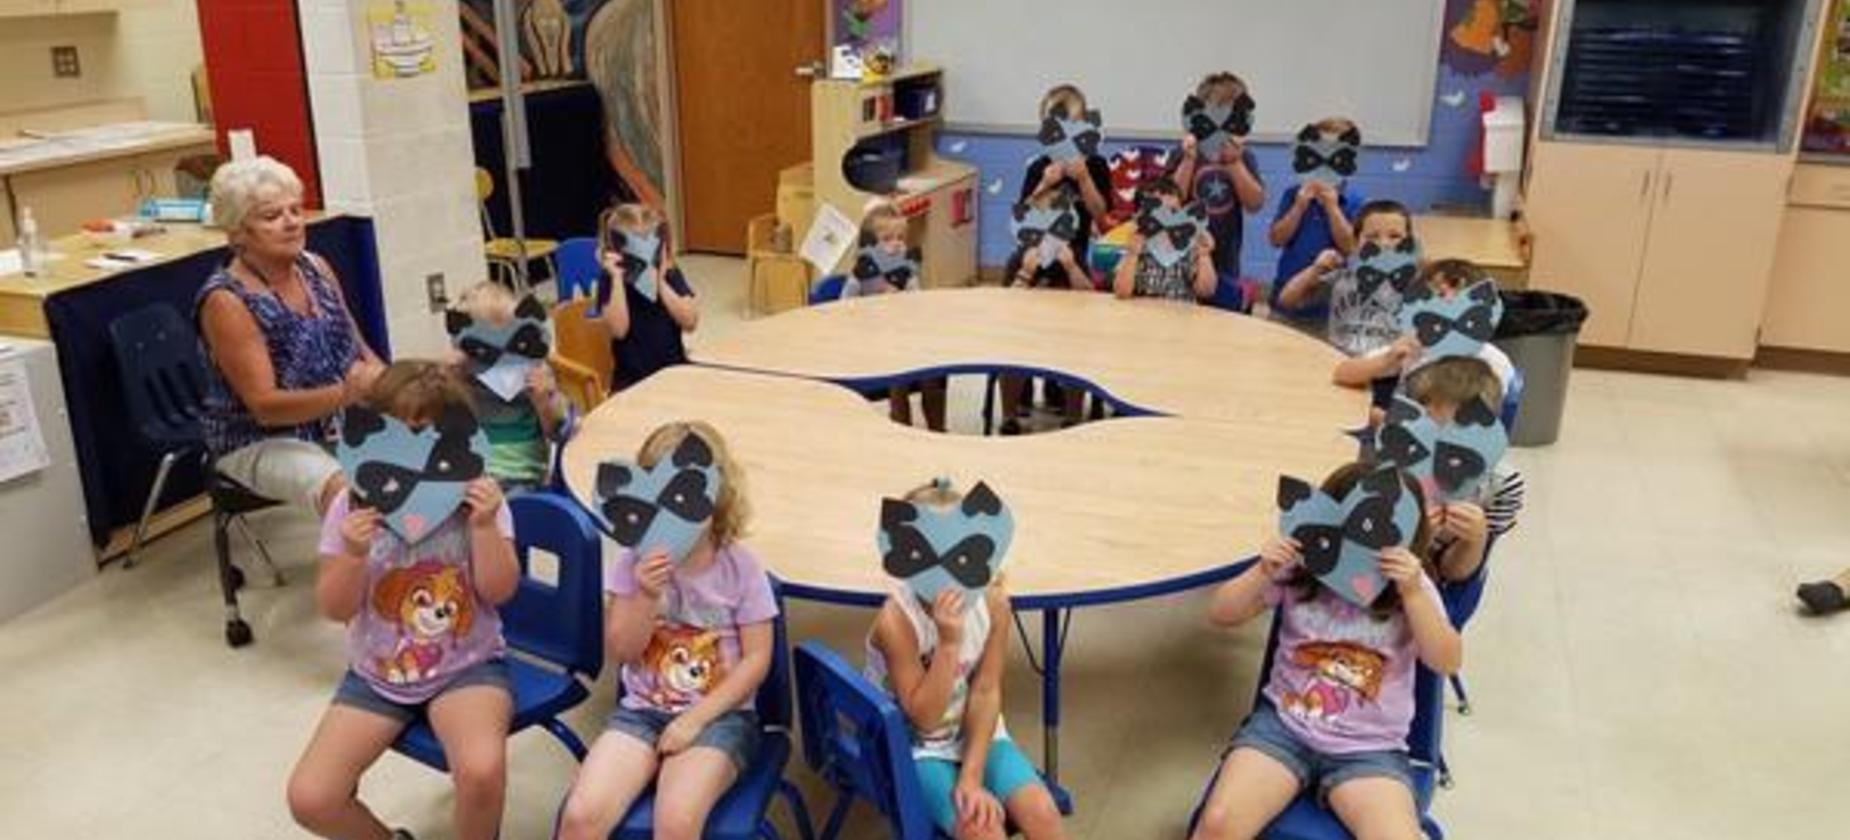 Preschool students displaying their artwork